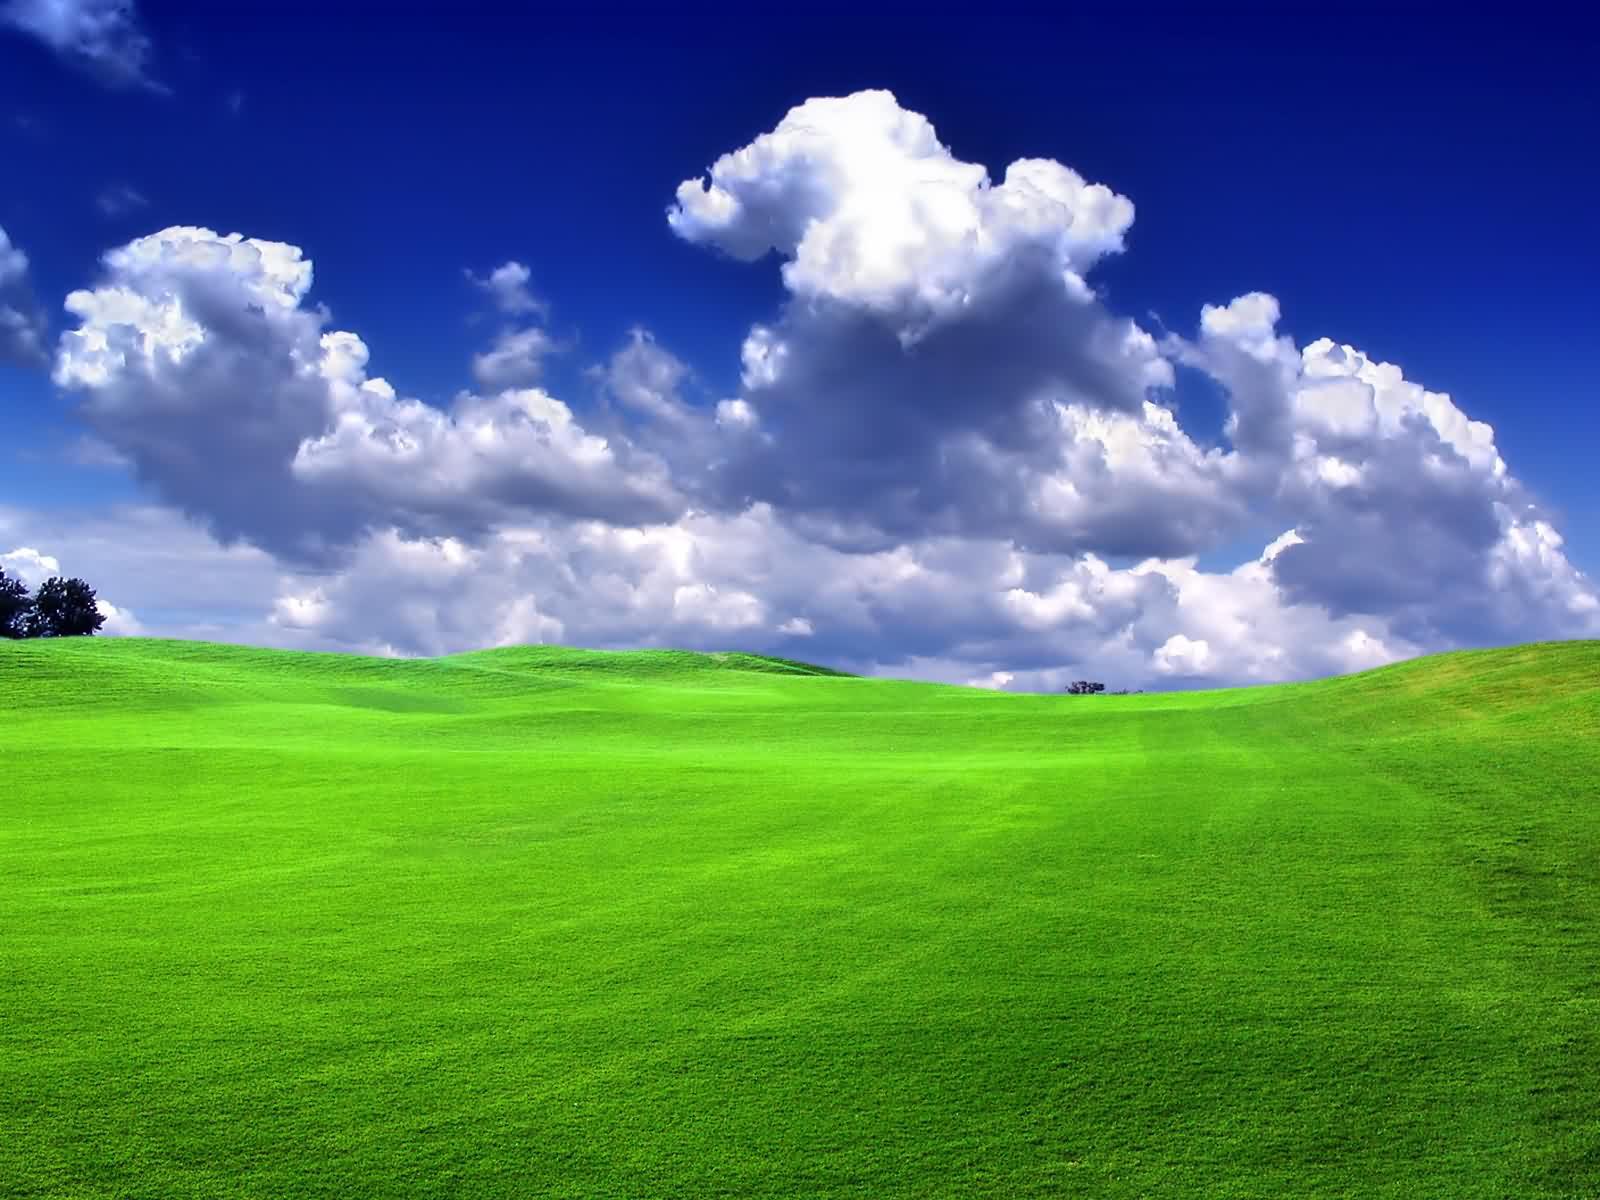 HD Wallpapers of Windows XP | HD Wallpapers